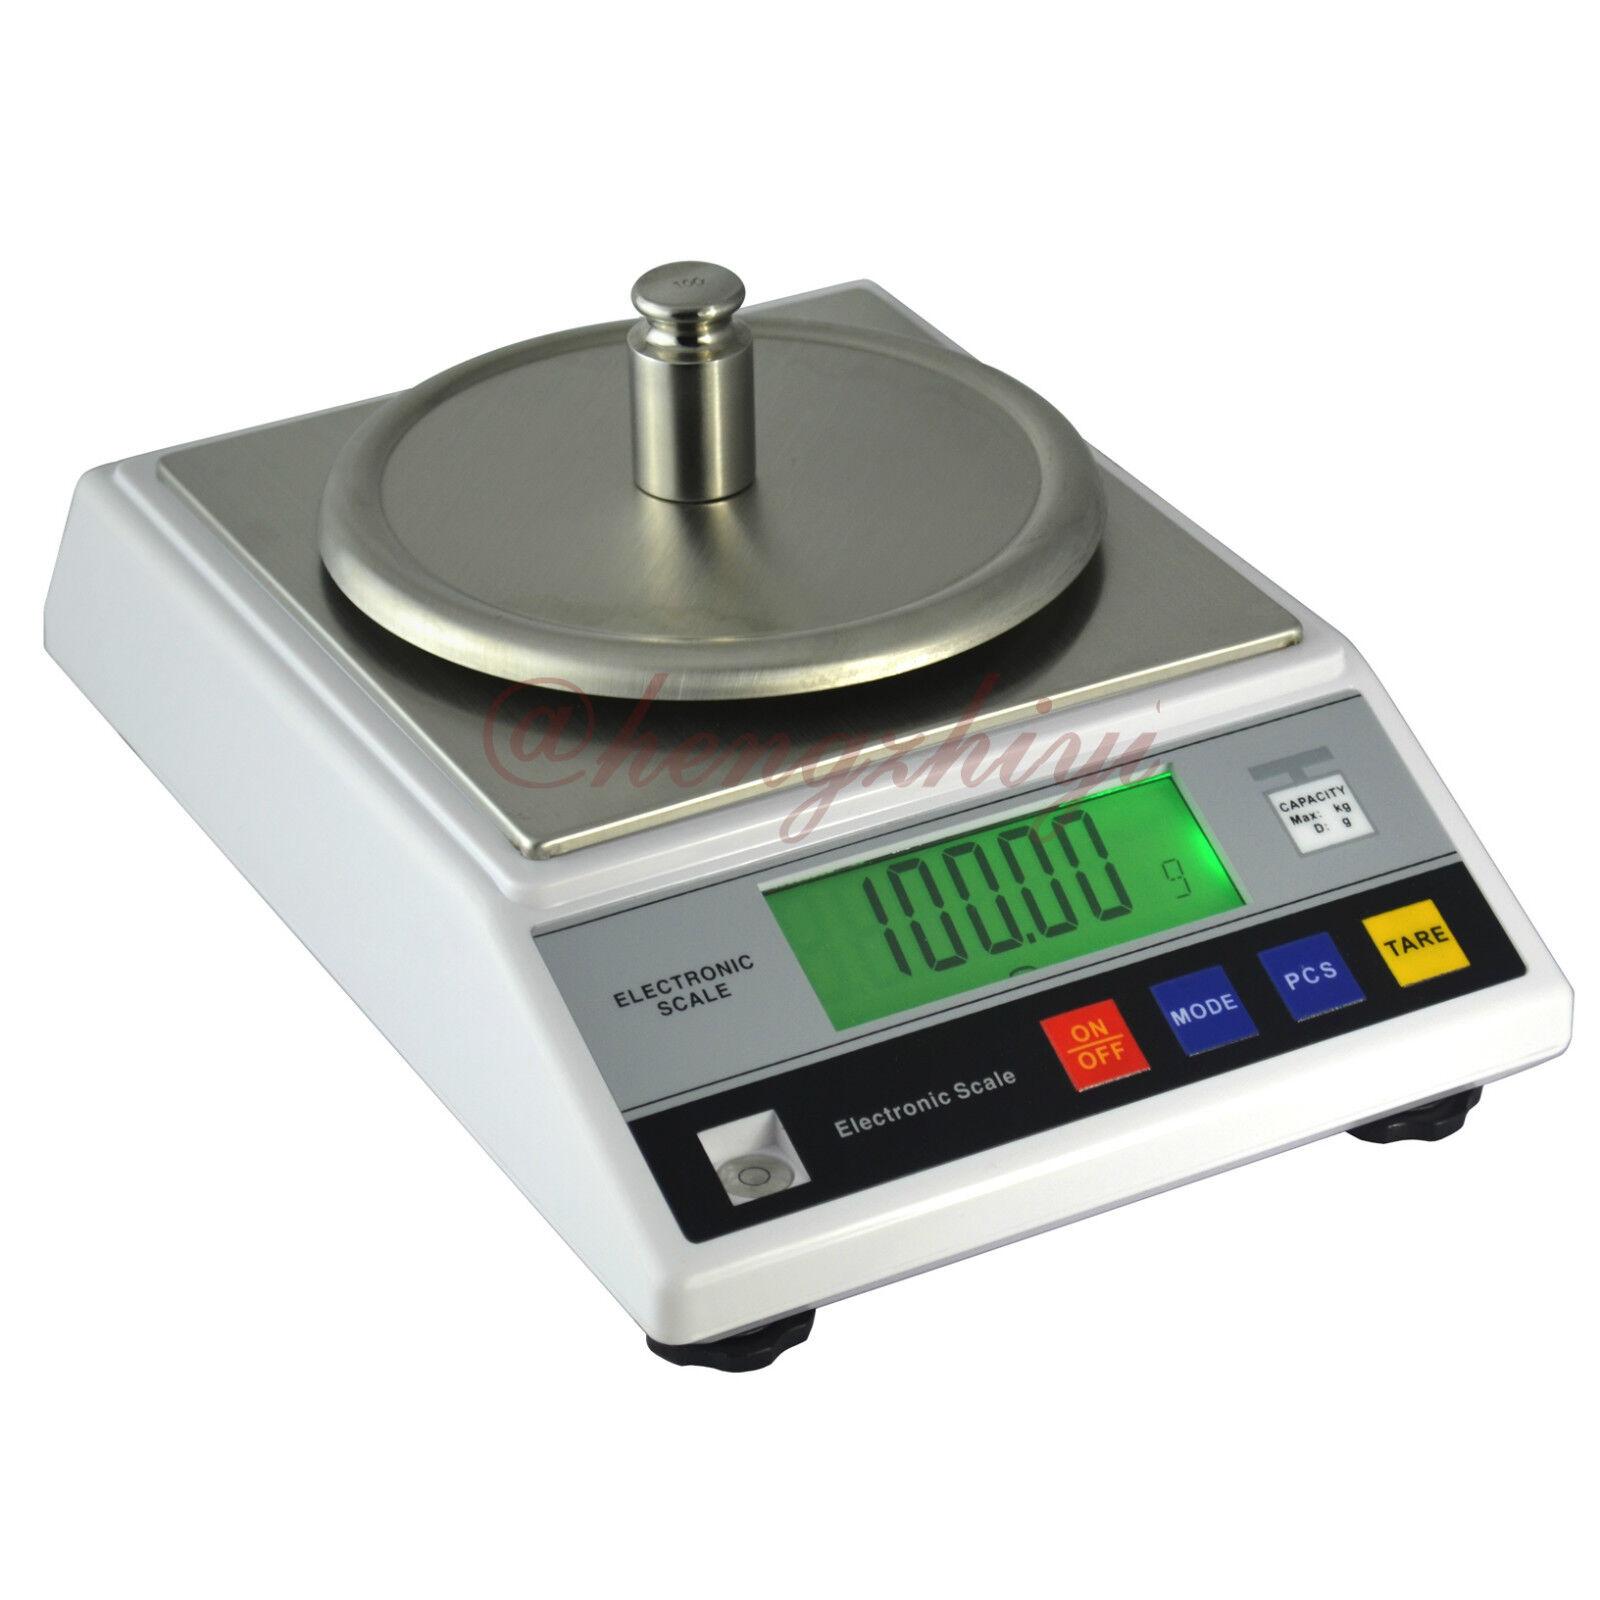 1000g x0.01g Digital Precision Carat Scale Balance w Germany Sensor+Counting 1kg